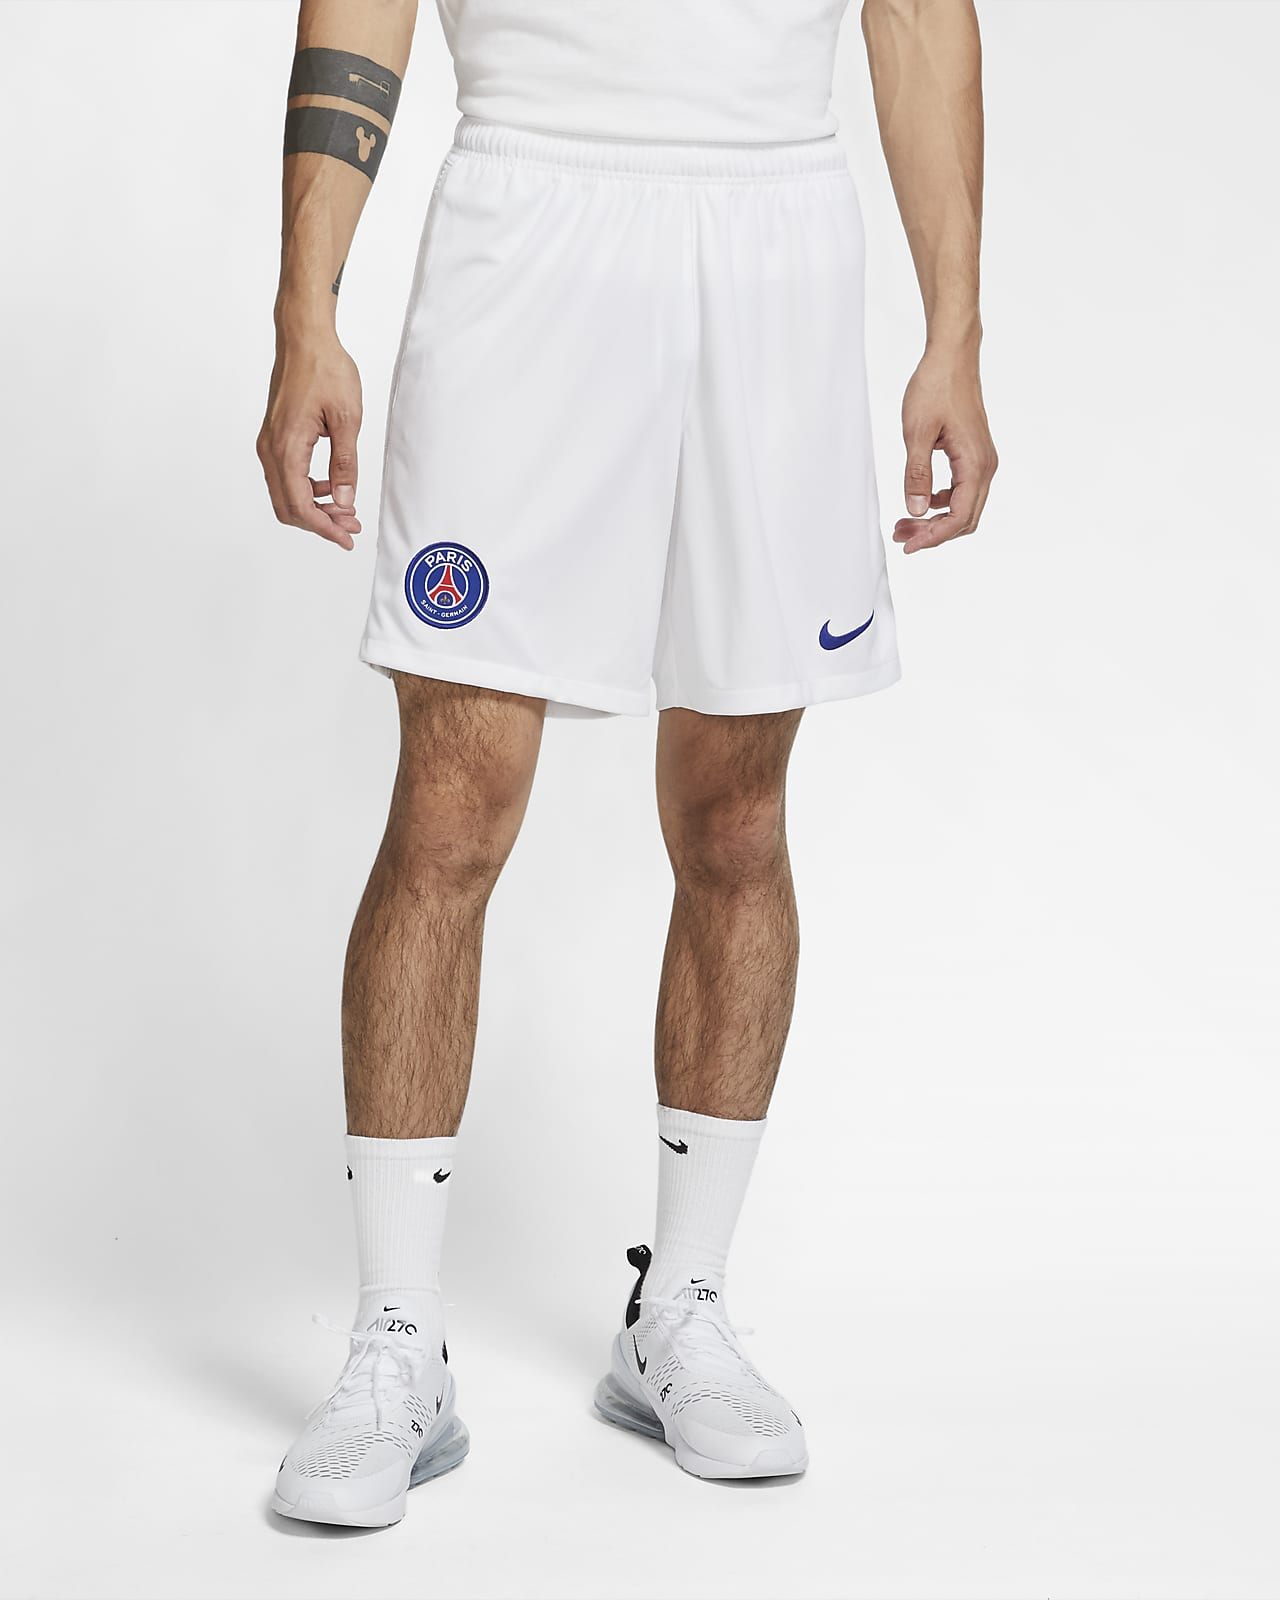 Primera/Segunda equipación Stadium París Saint-Germain 2020/21 Pantalón corto de fútbol - Hombre